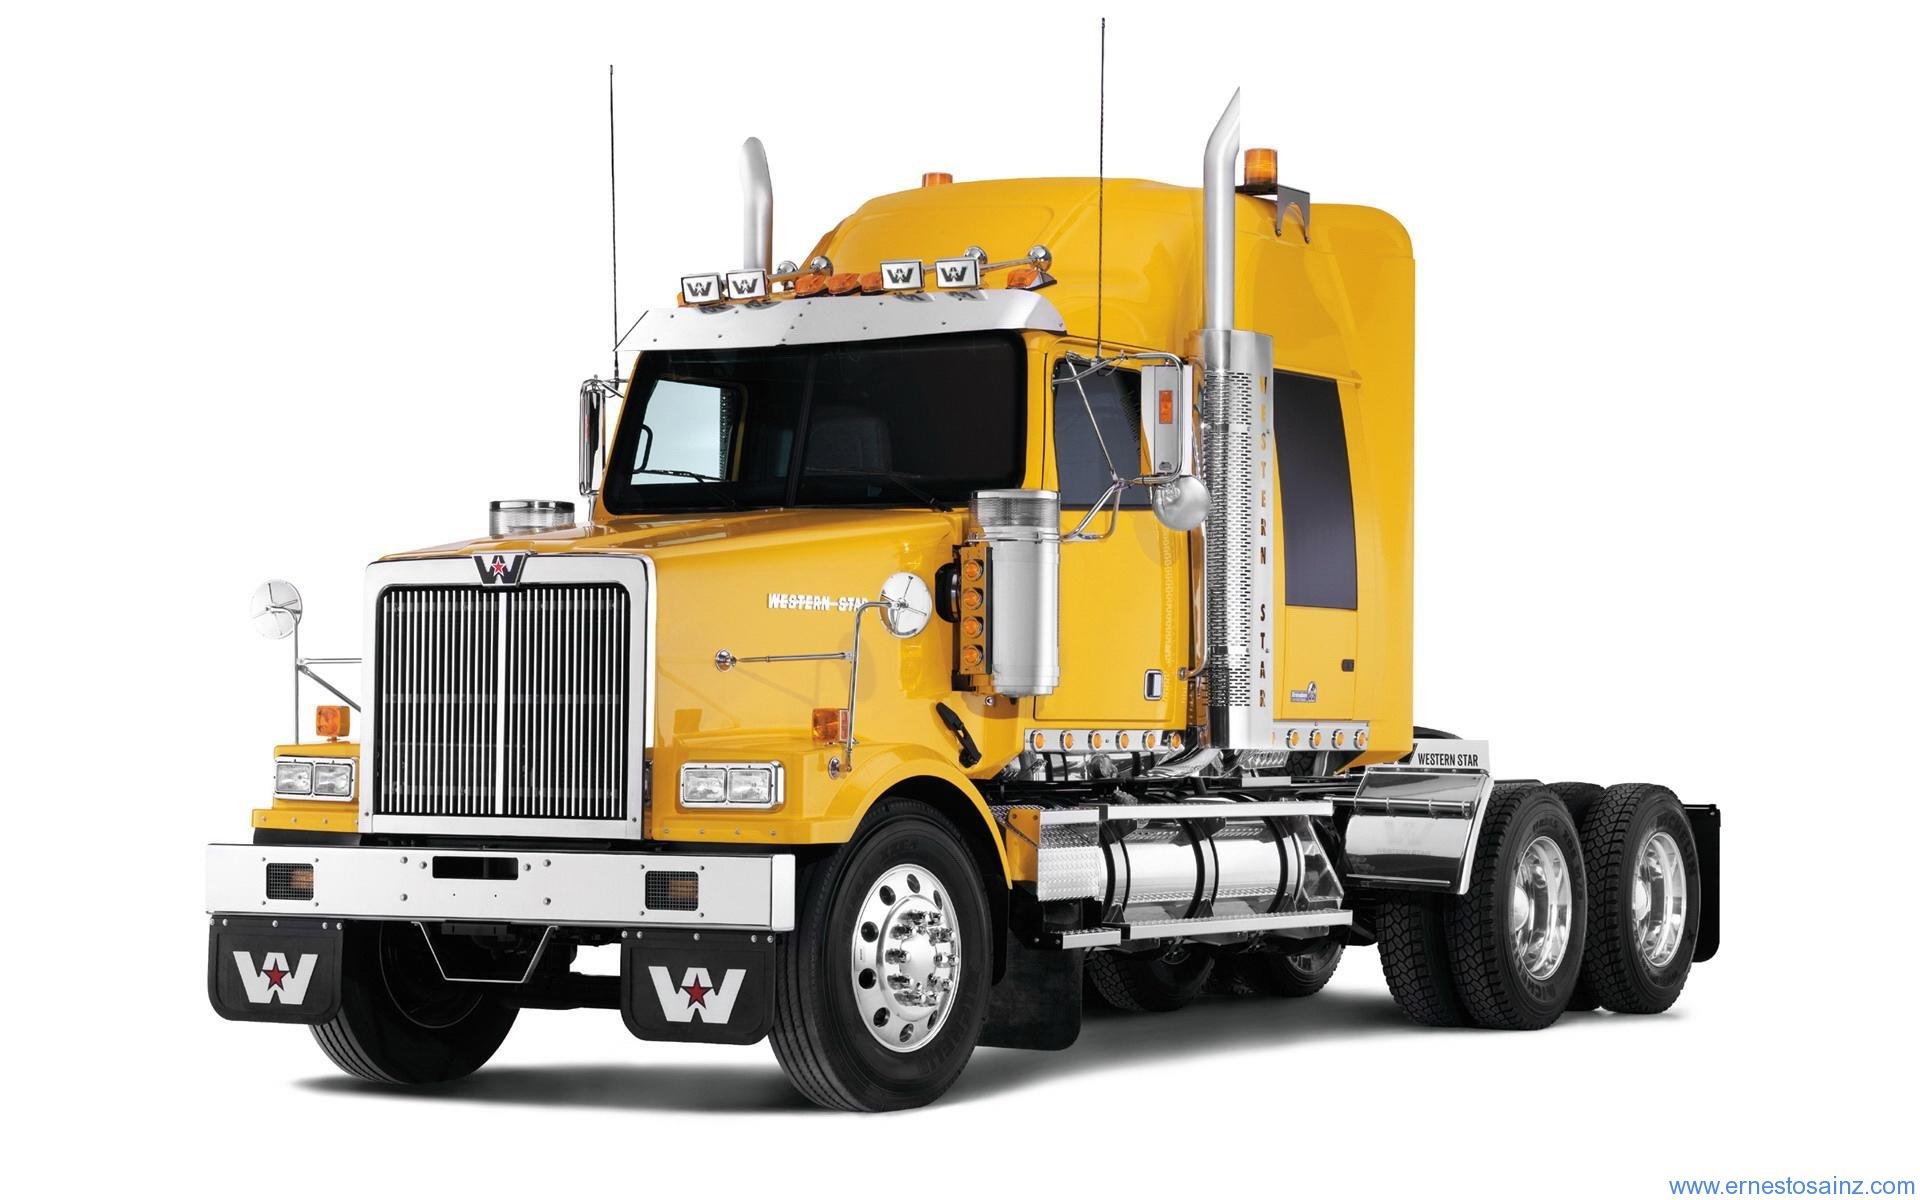 camion western amarillo. Black Bedroom Furniture Sets. Home Design Ideas